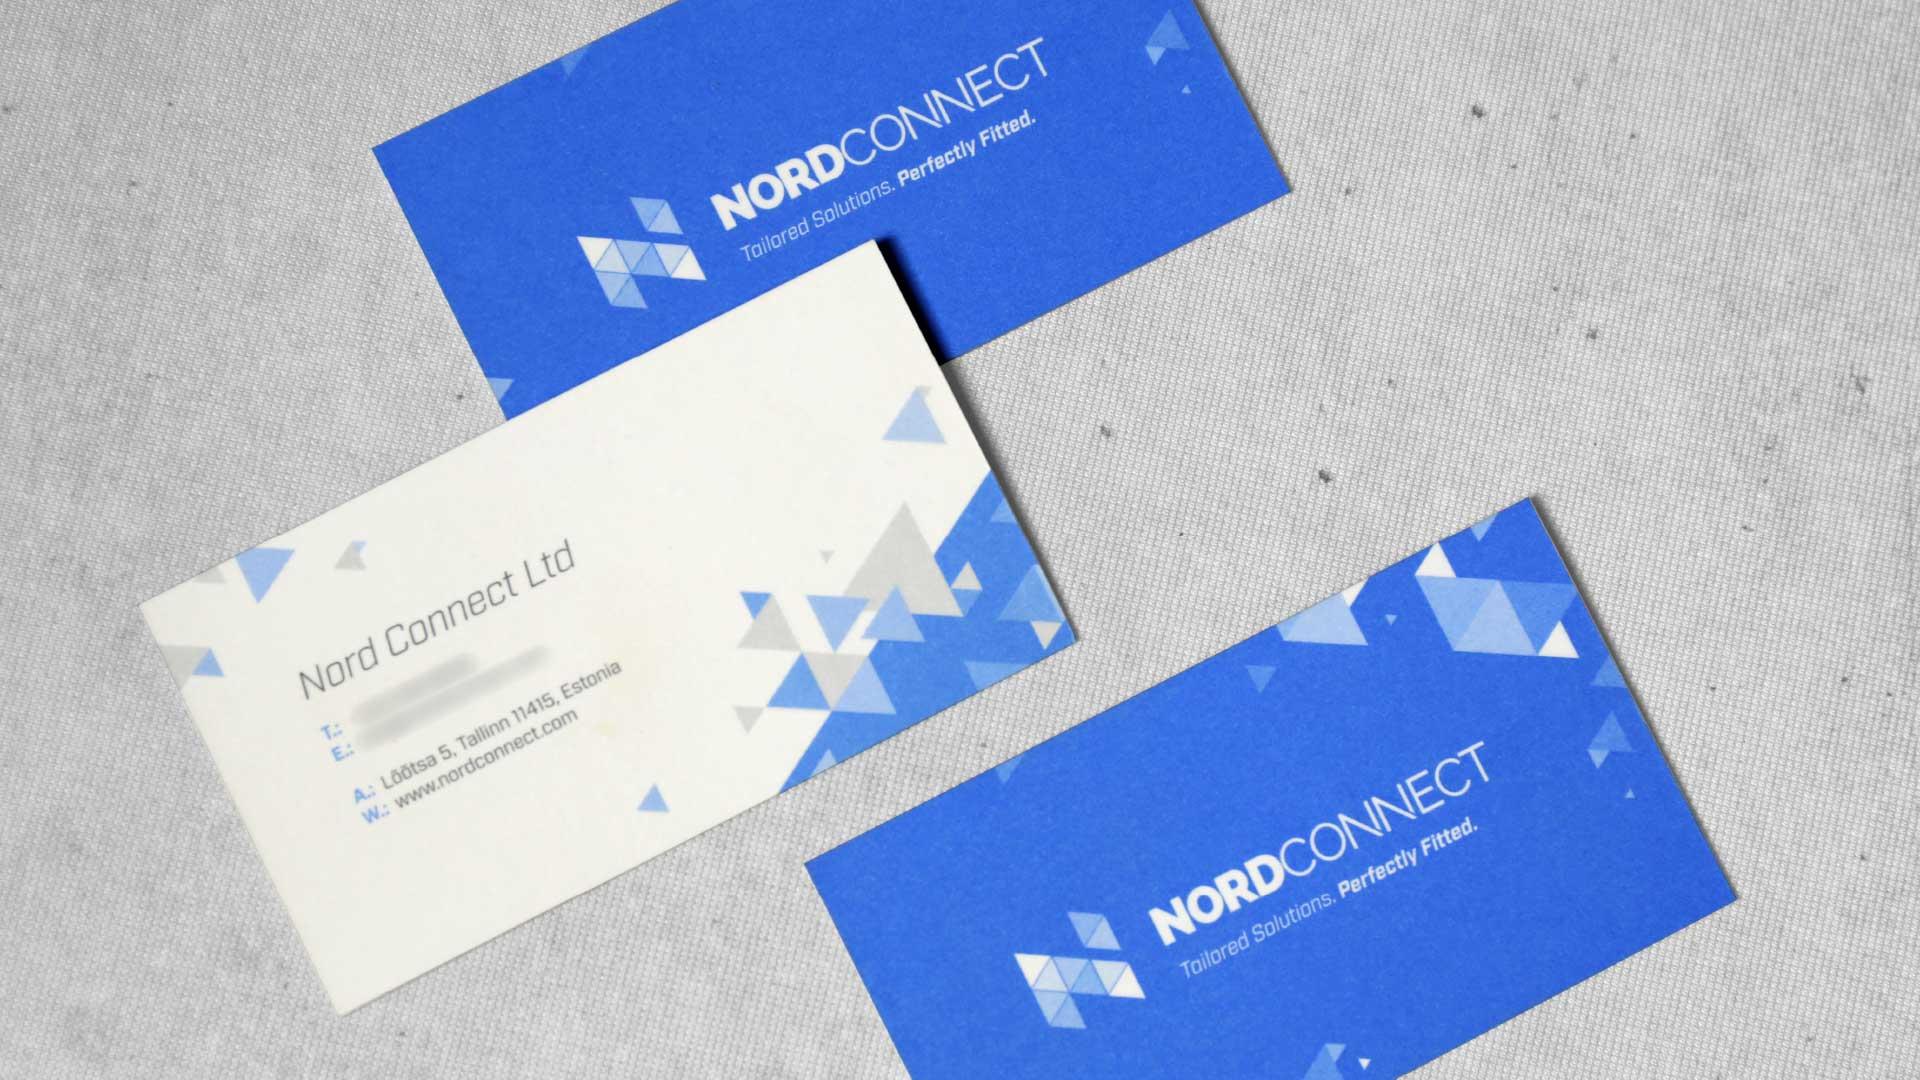 Vizītkaršu druka, dizains Nordconnect